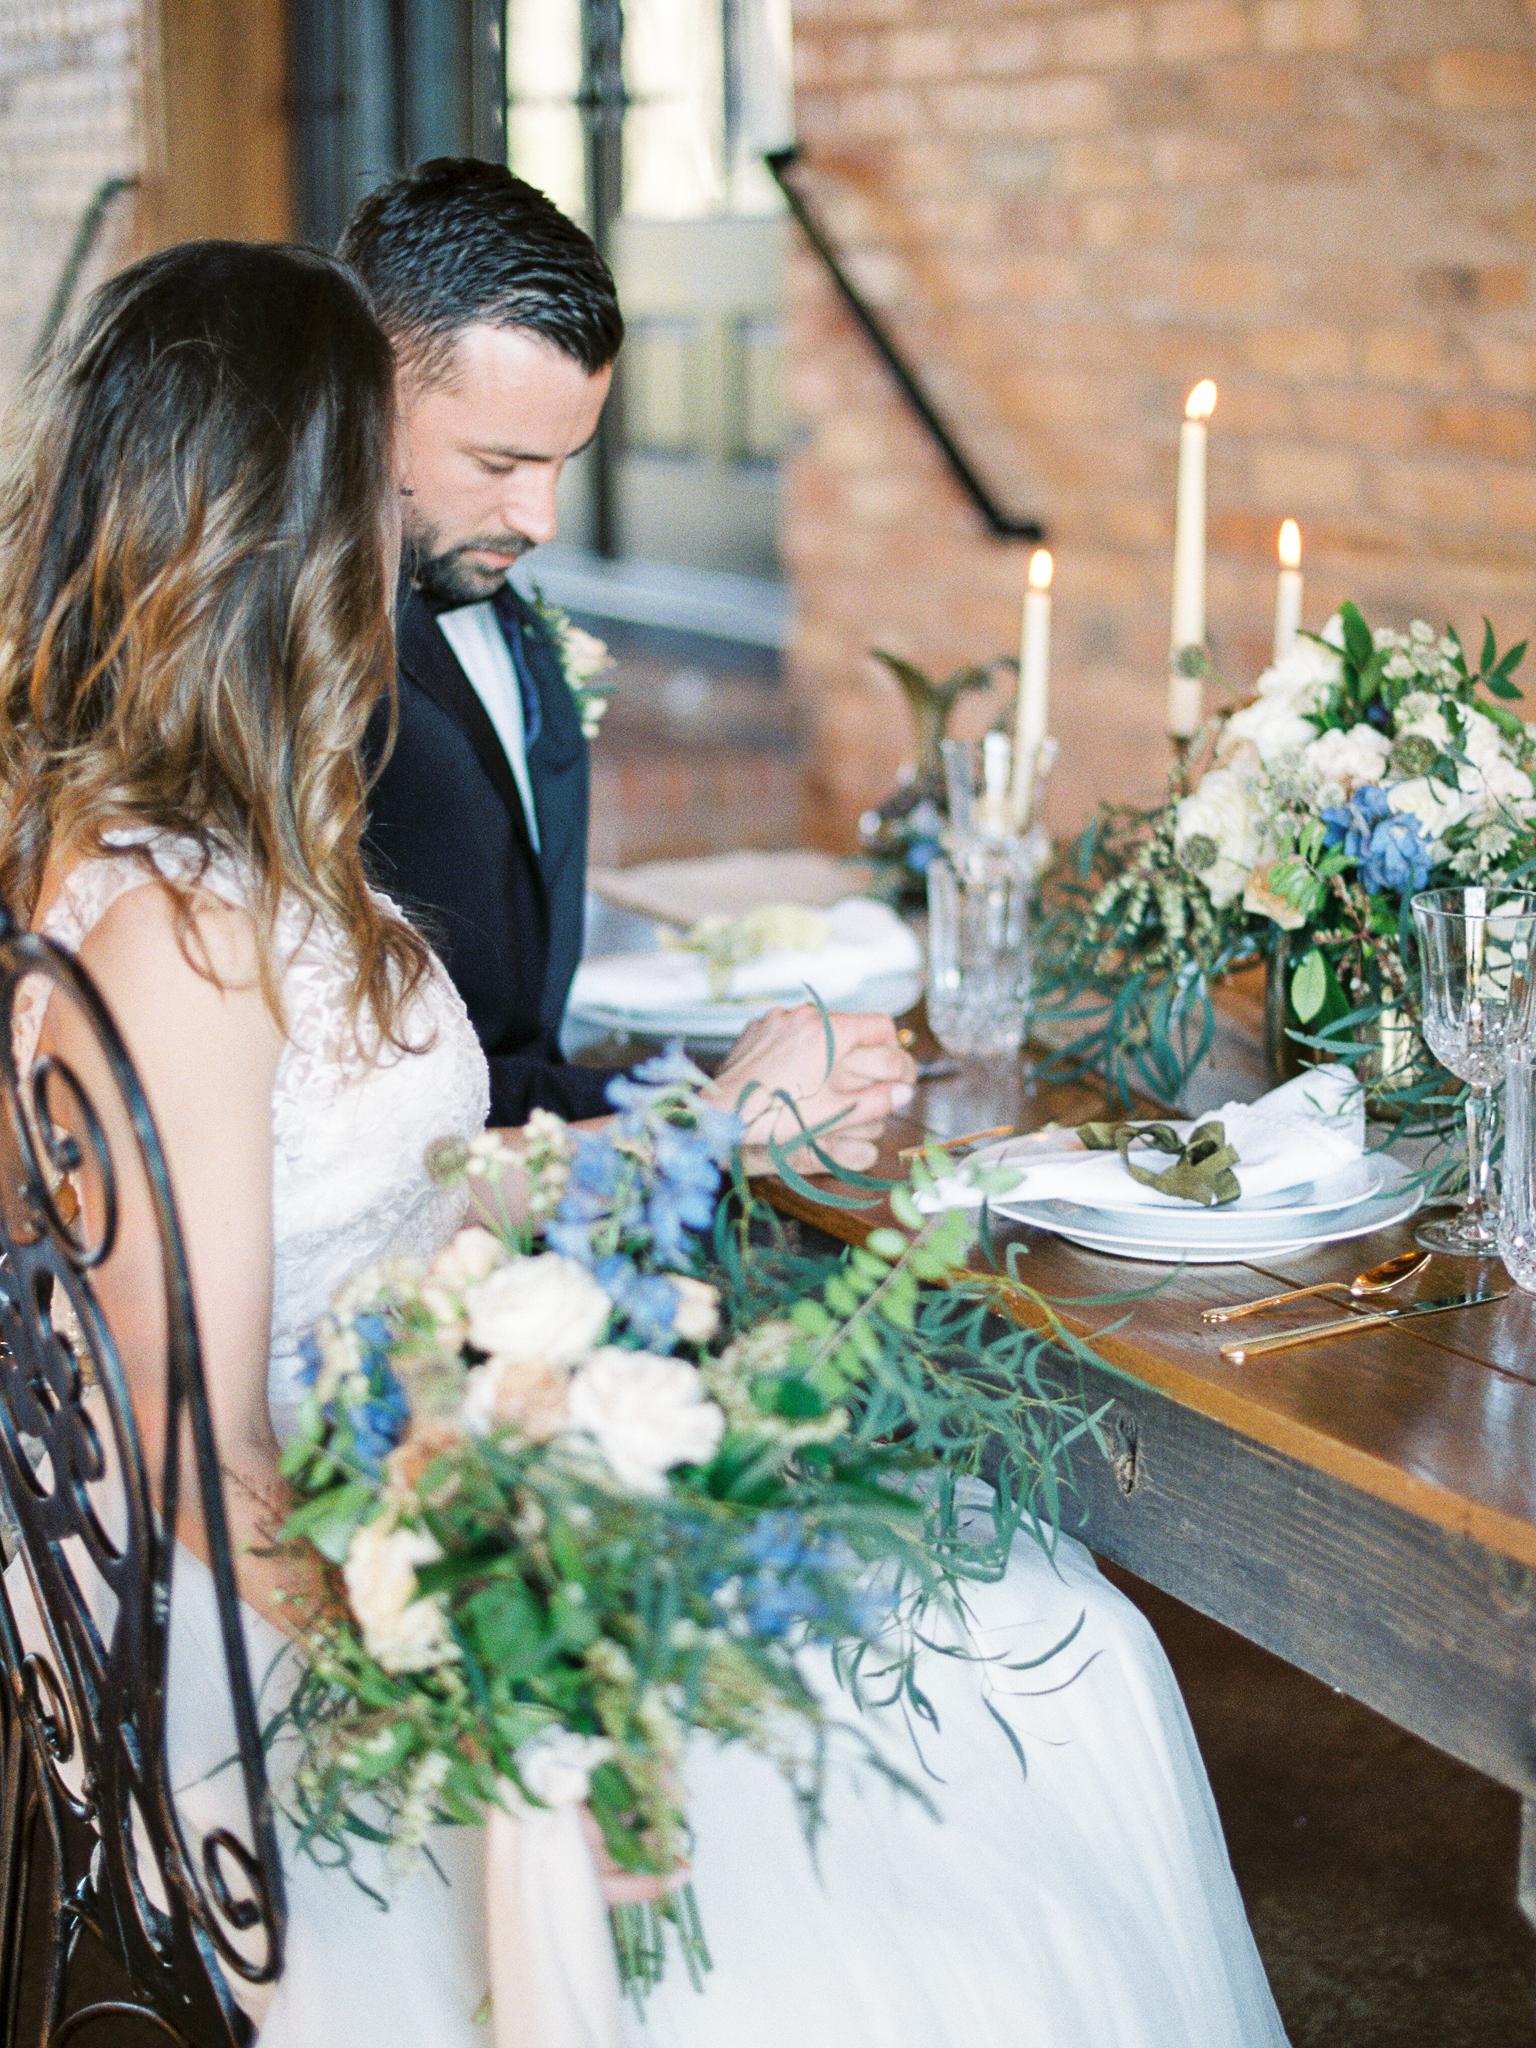 christinadavis+weddinginspiration29.jpg